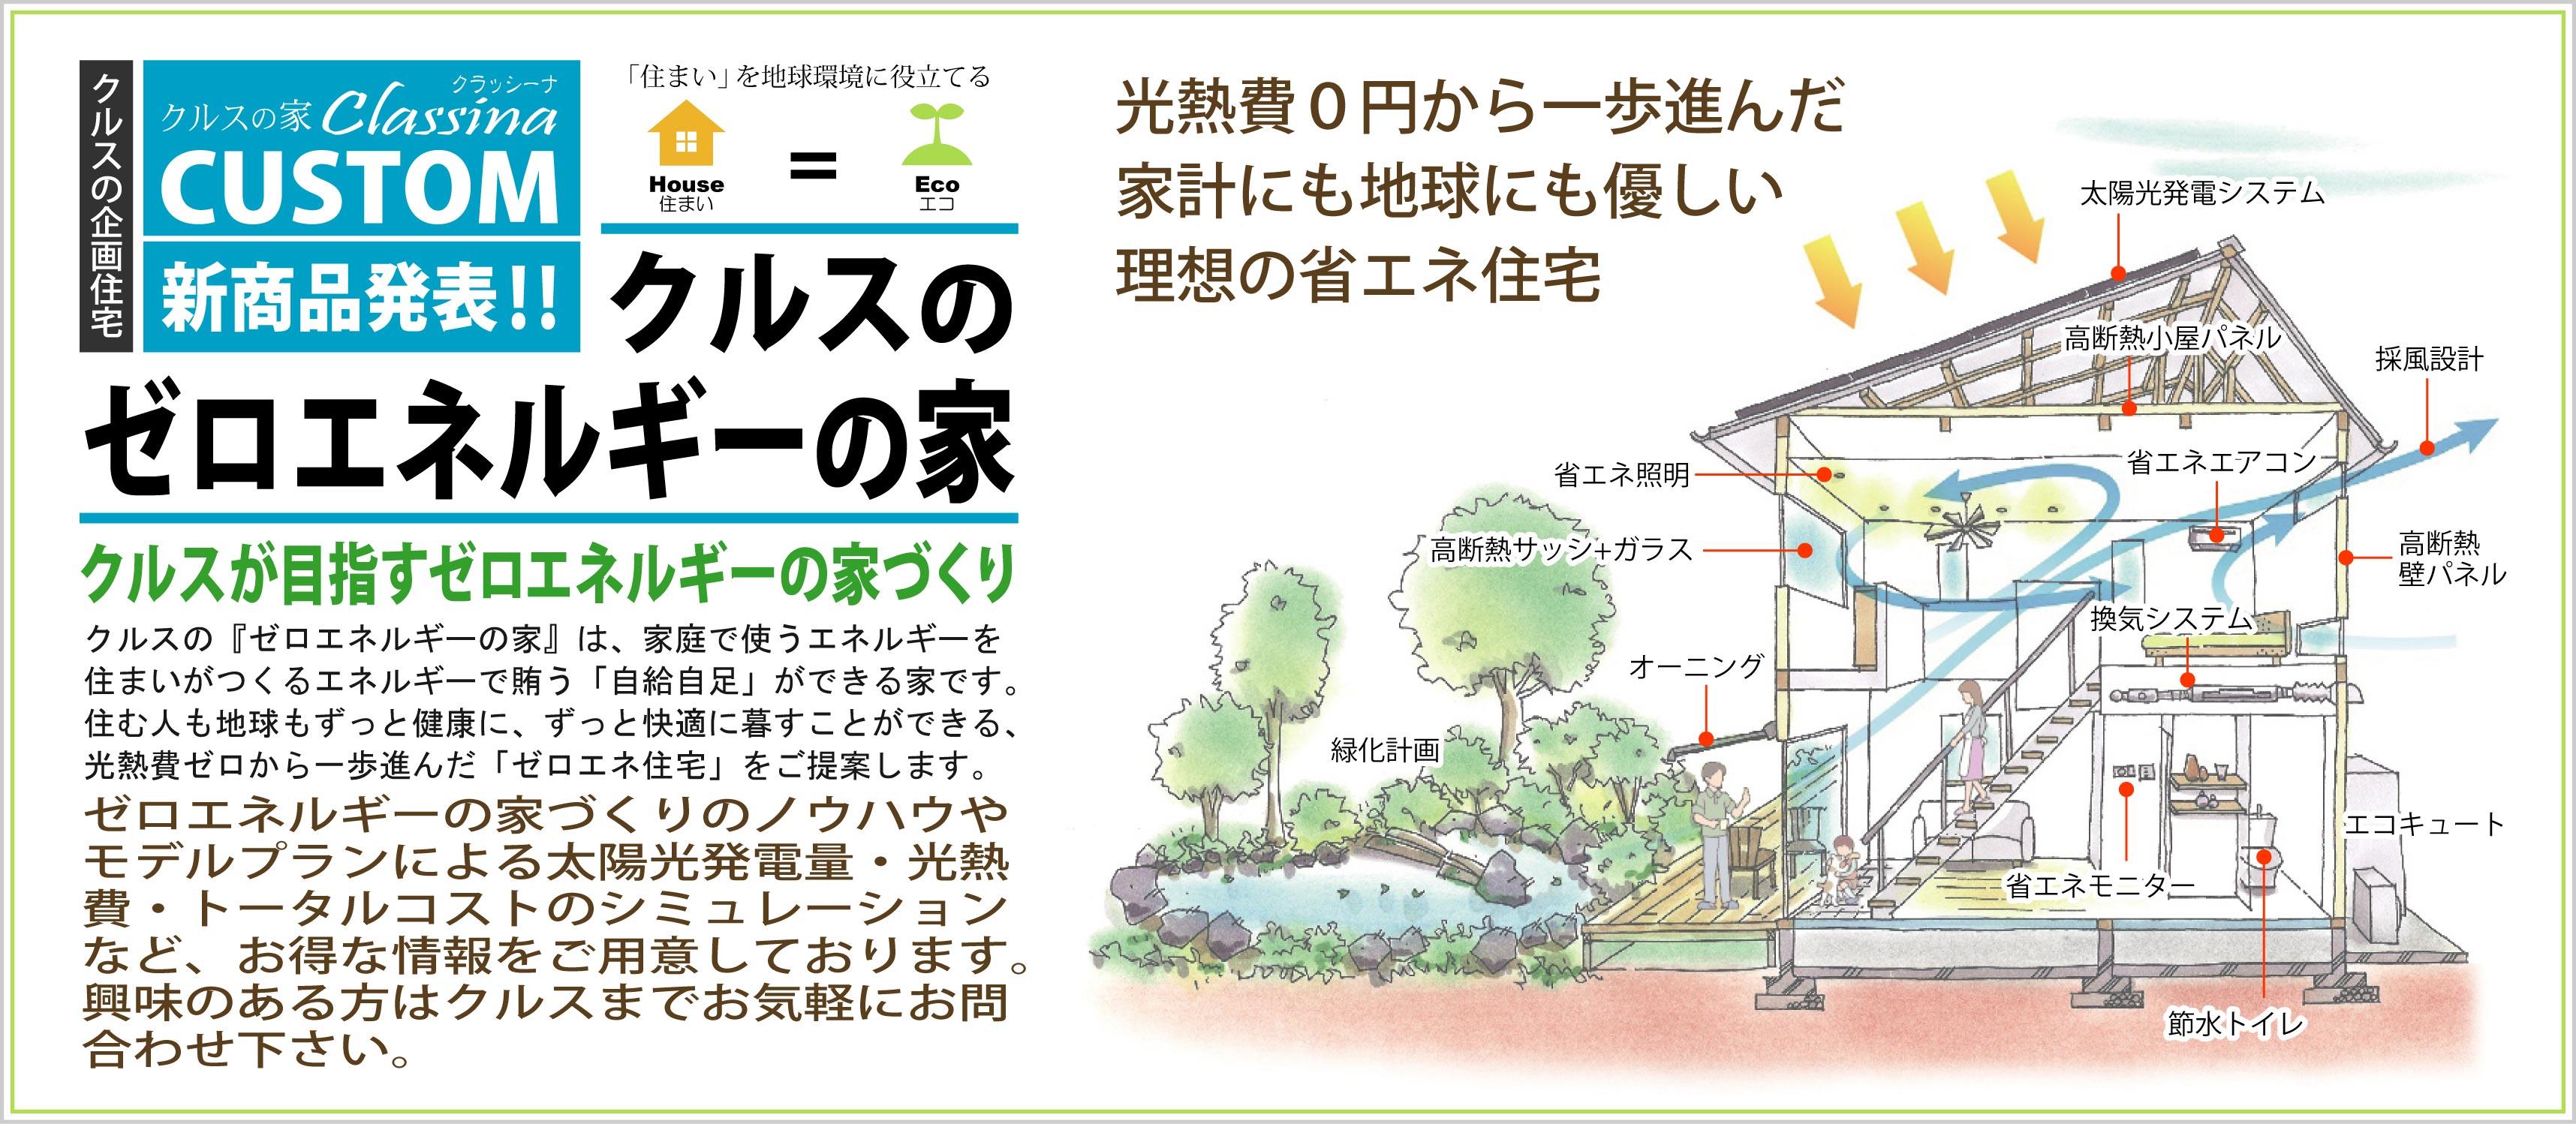 KuraSi-natu-sin79-15.jpg